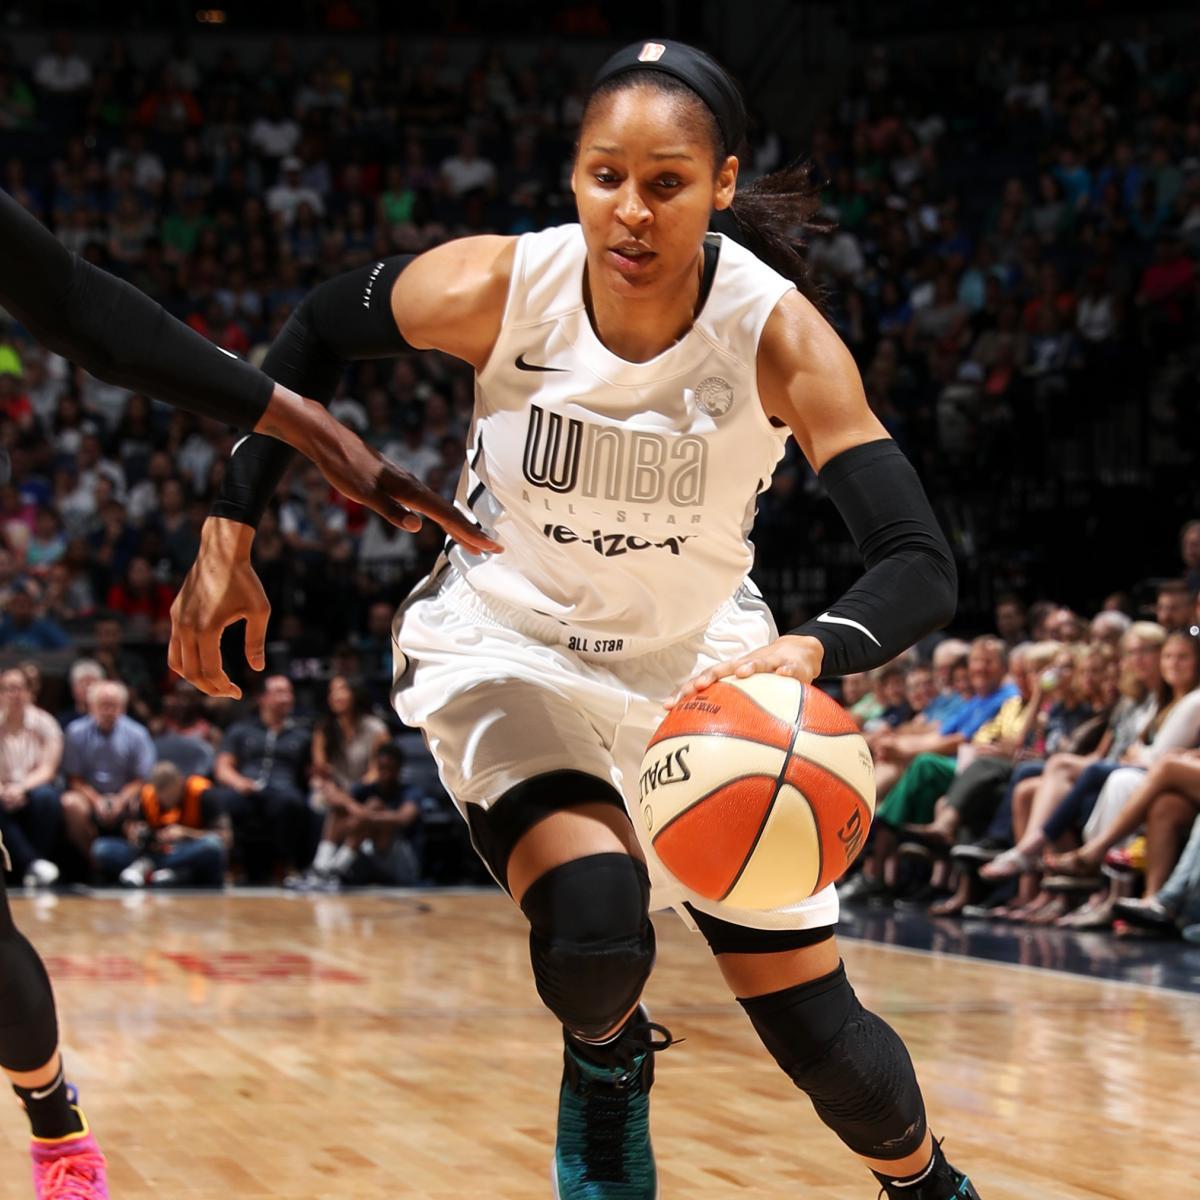 Colorado Shooting R H Youtube Com: Maya Moore Wins MVP As Team Parker Takes 2018 WNBA All